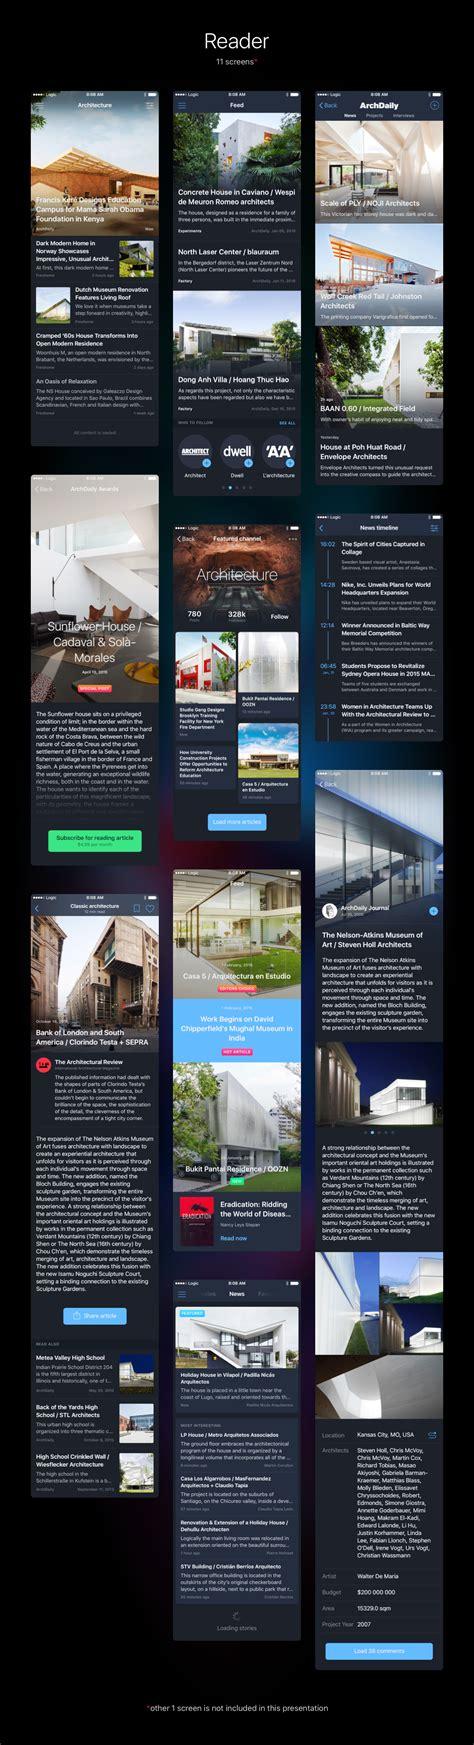 themeforest launchkit logic ios kit by kornikow themeforest